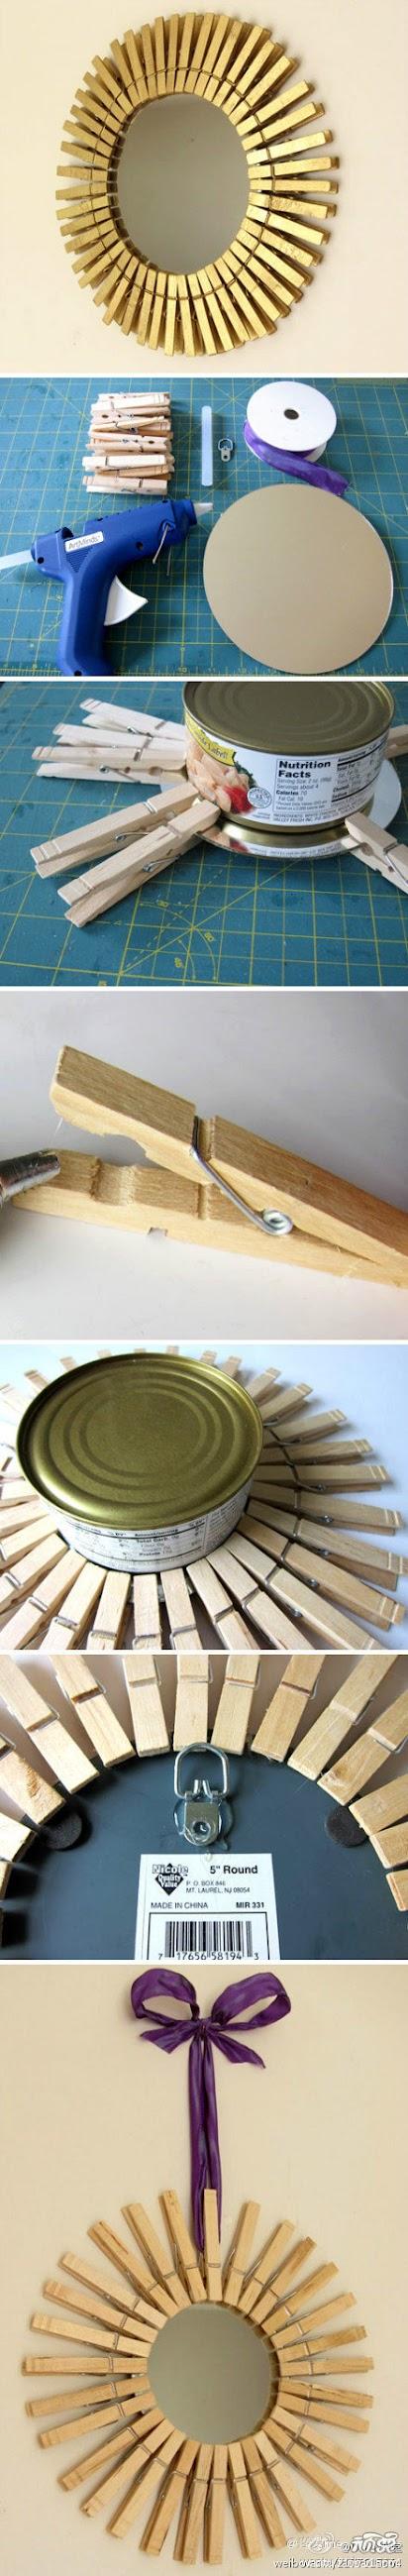 Make ikea Style Round Mirror